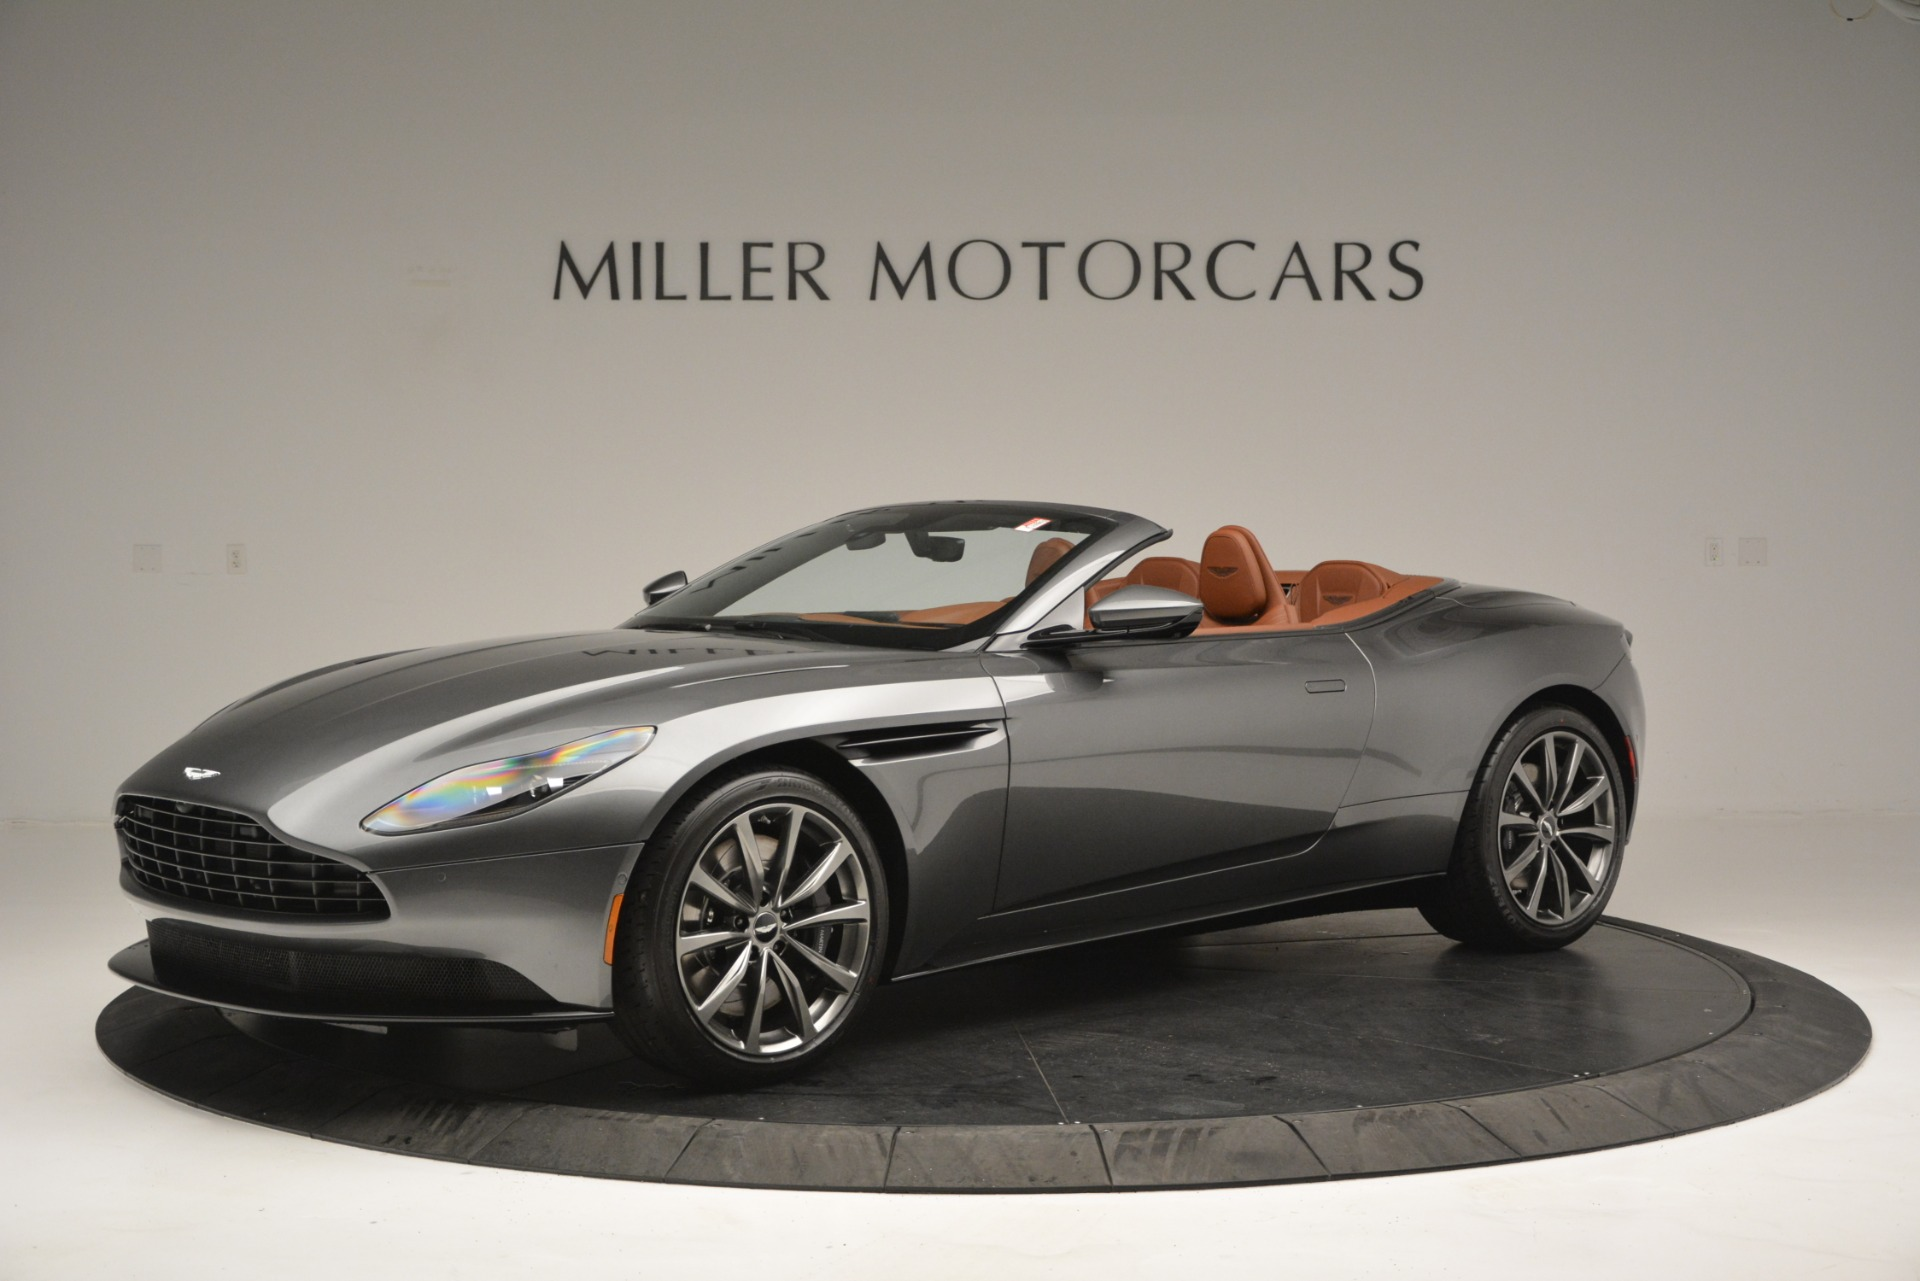 Used 2019 Aston Martin DB11 Volante for sale $214,990 at McLaren Greenwich in Greenwich CT 06830 1